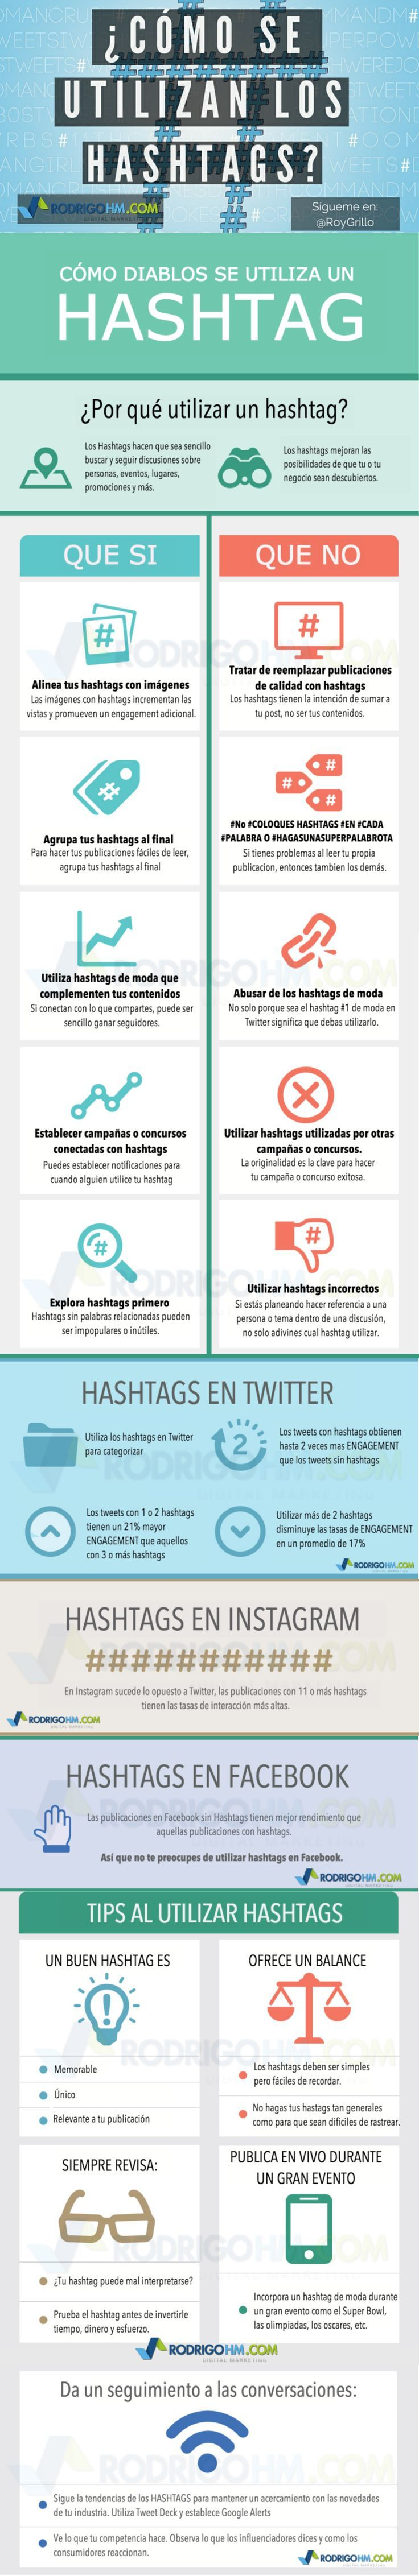 Redes Sociales: cómo usar los hashtags #infografia #infographic #socialmedia: